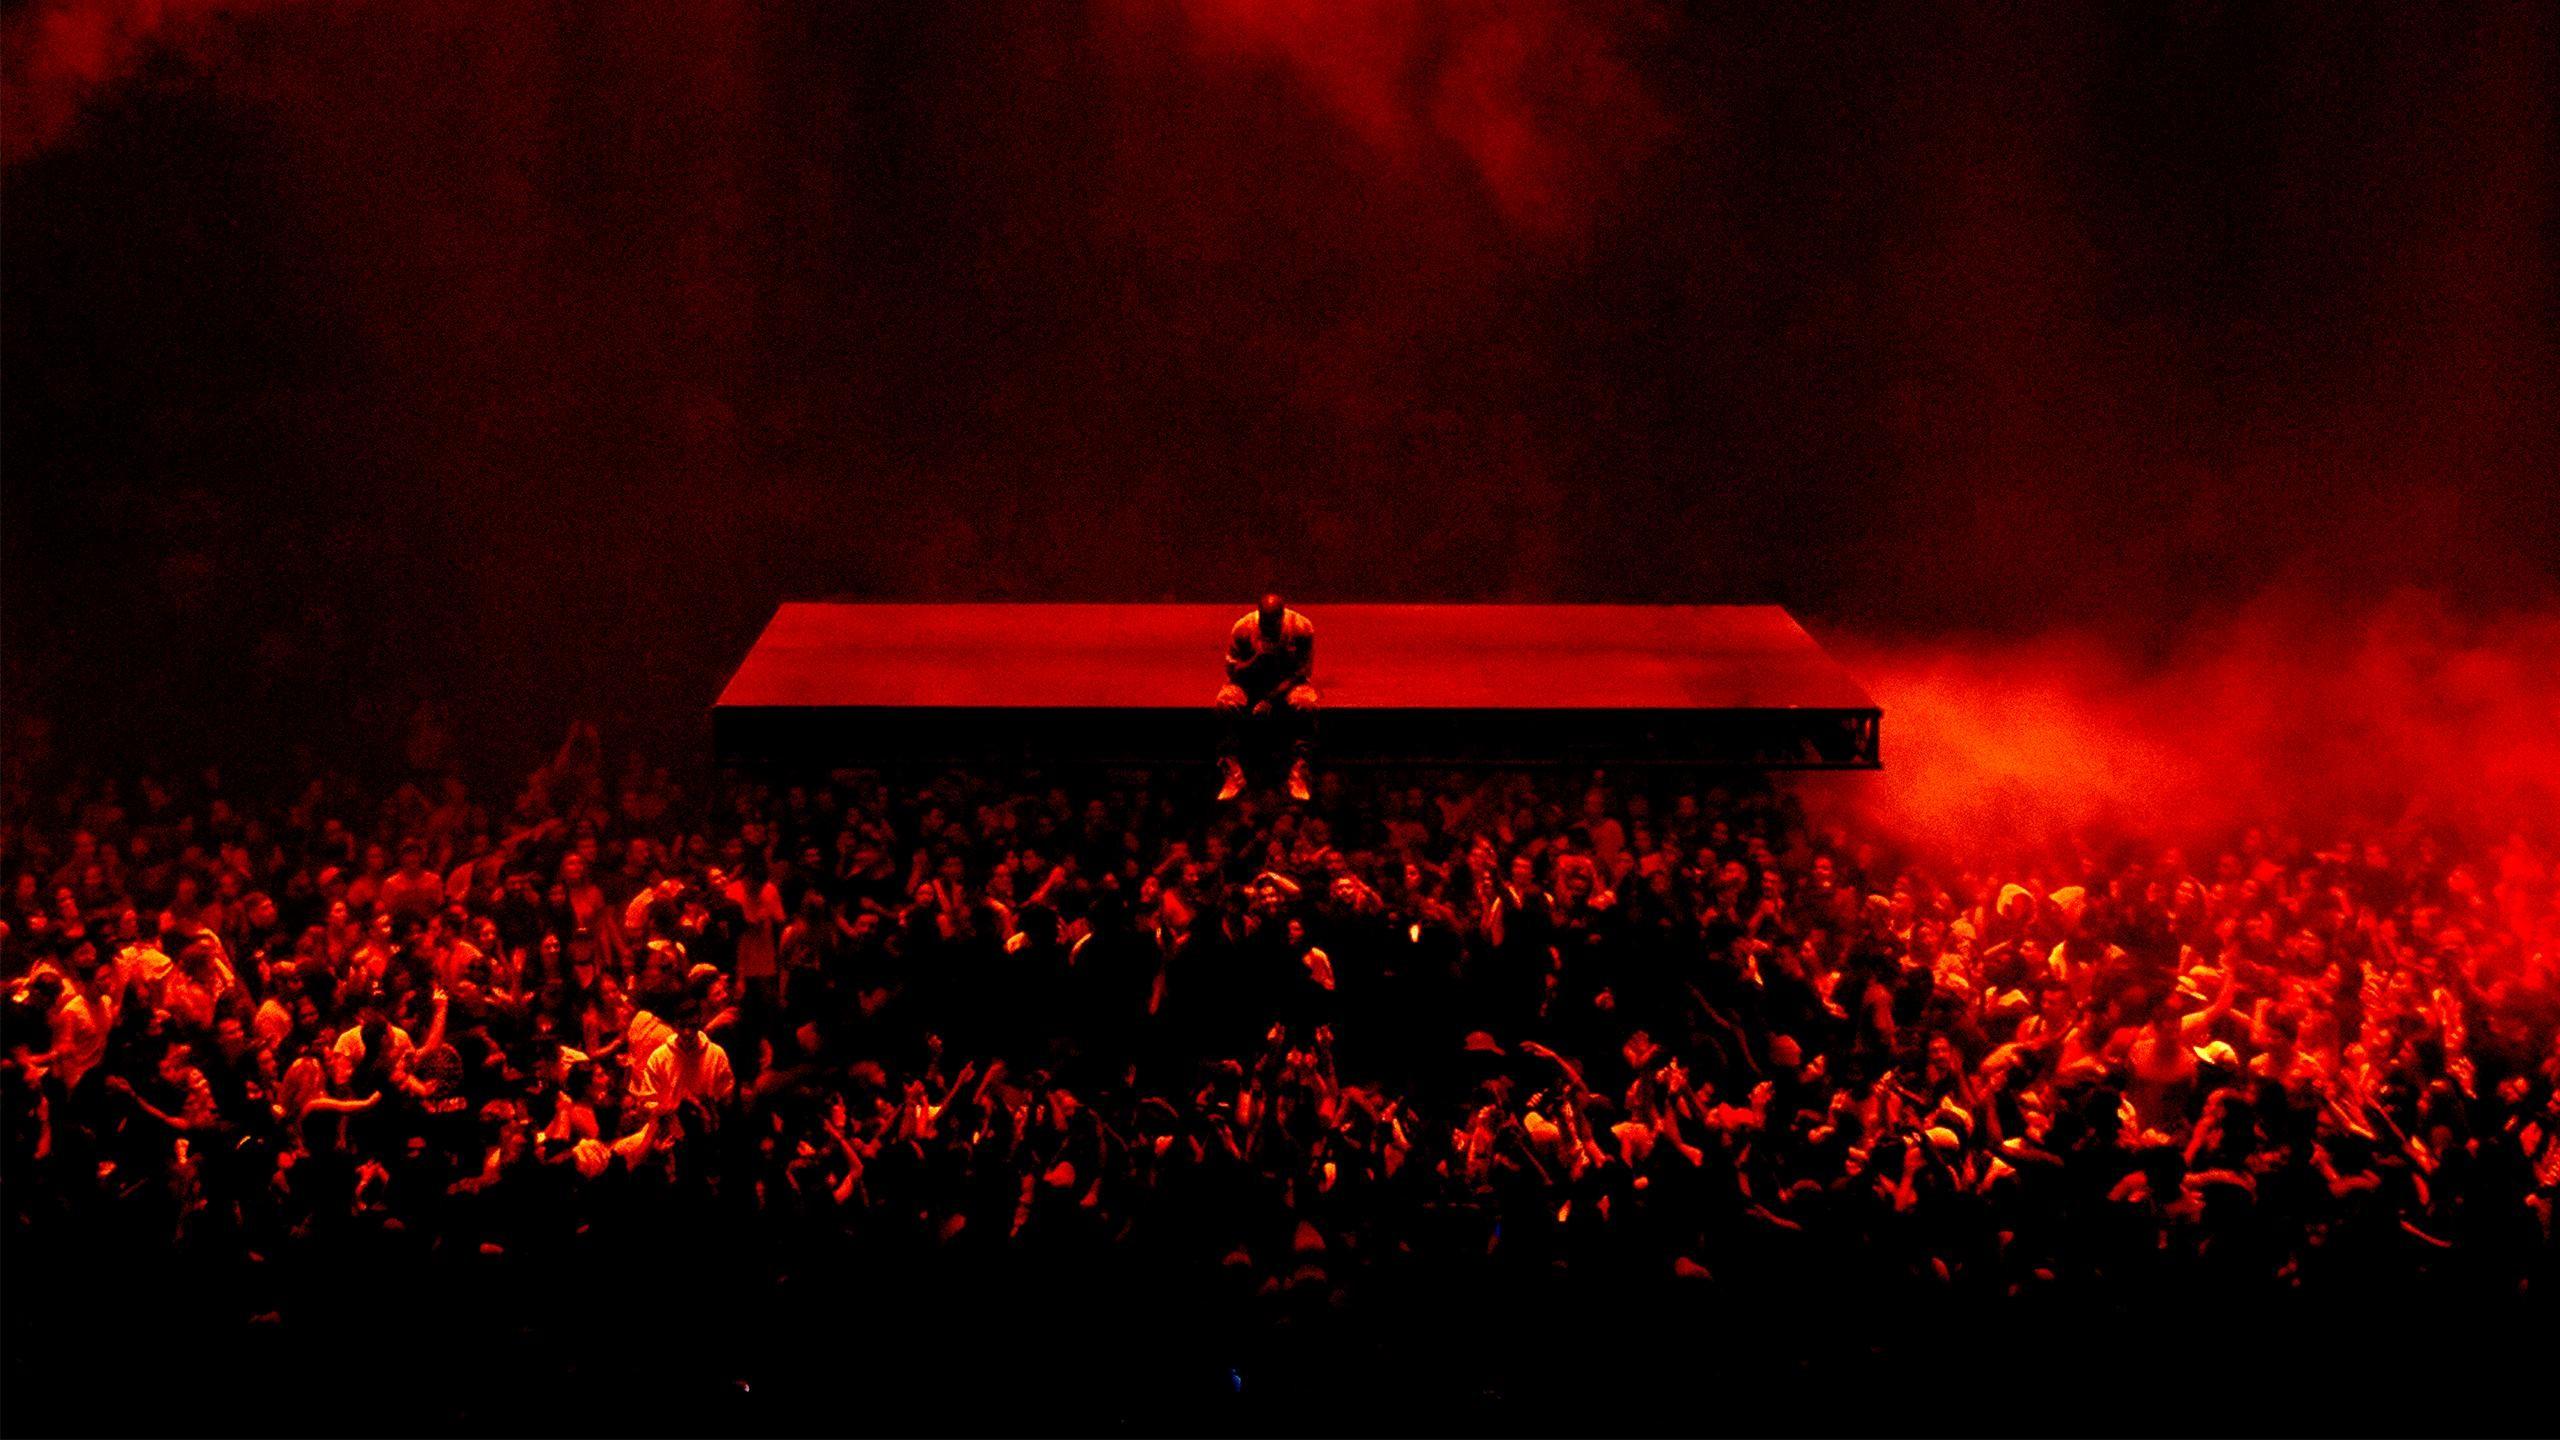 Kanye West wallpaper ·① Download free cool High Resolution ... Kanye West Yeezus Concert